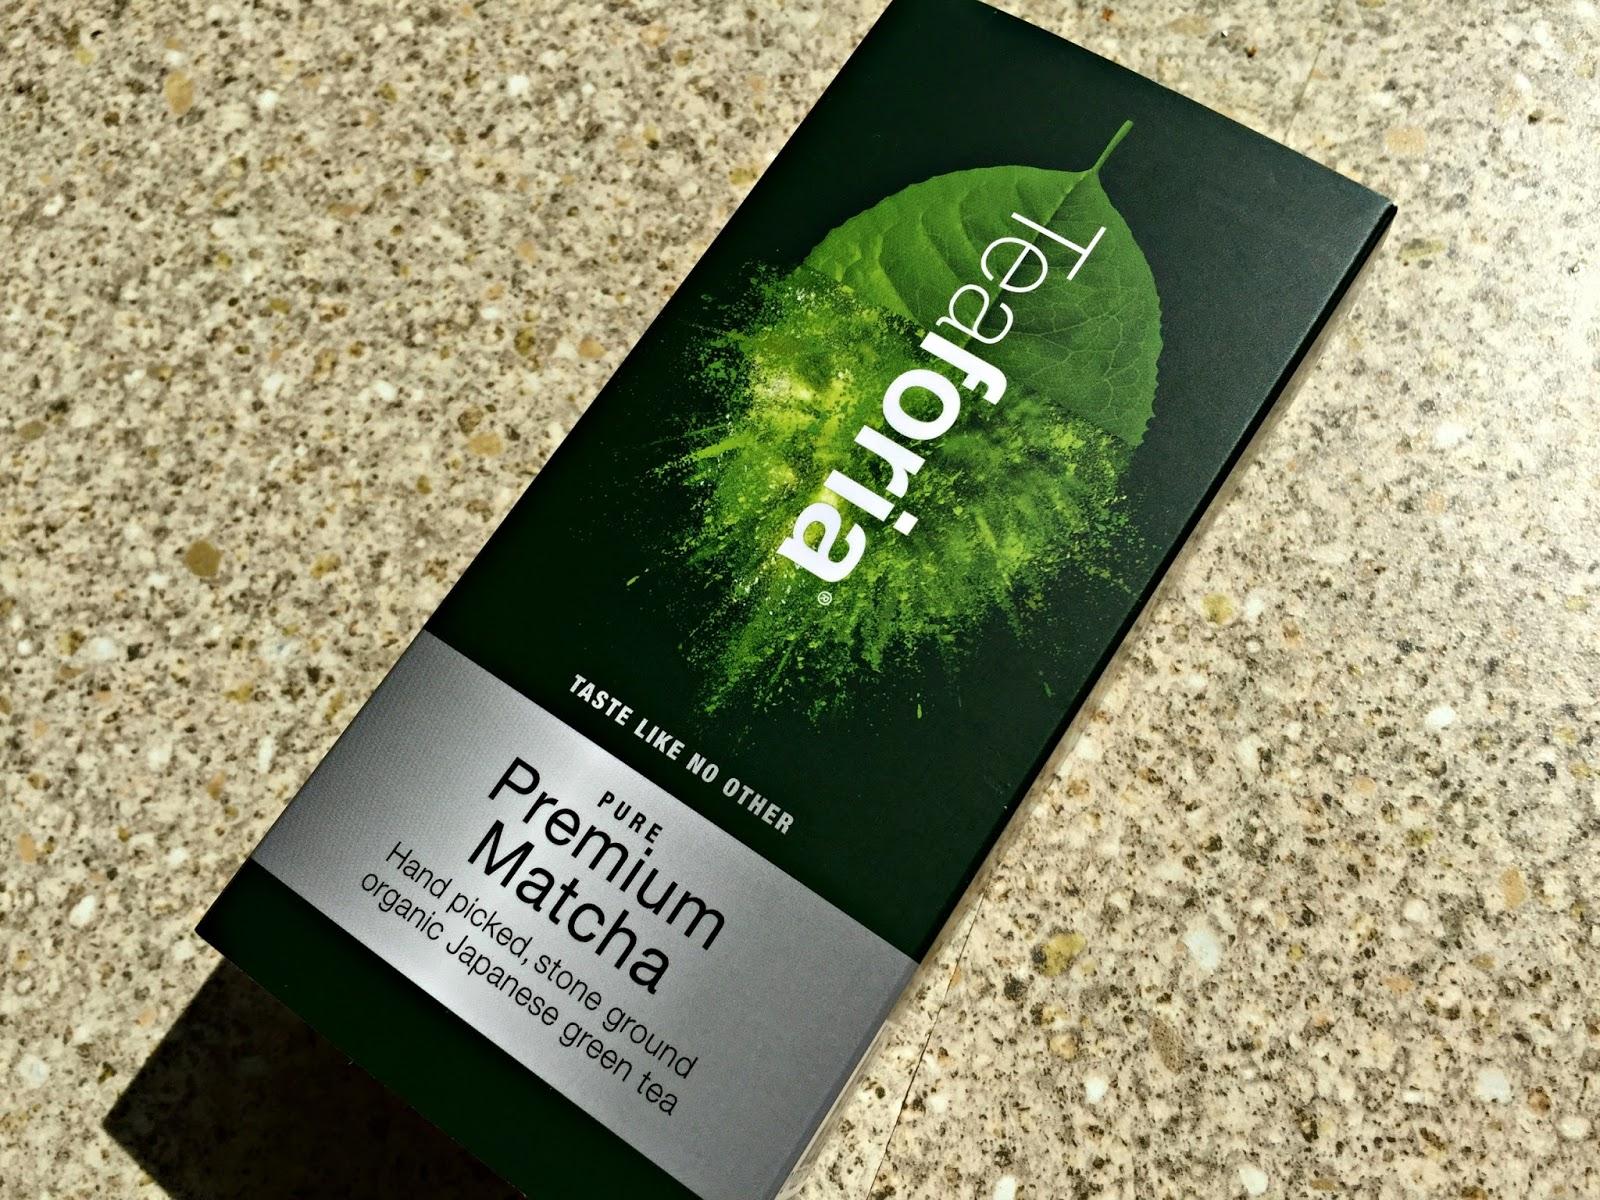 Teaforia Premium Matcha Tea